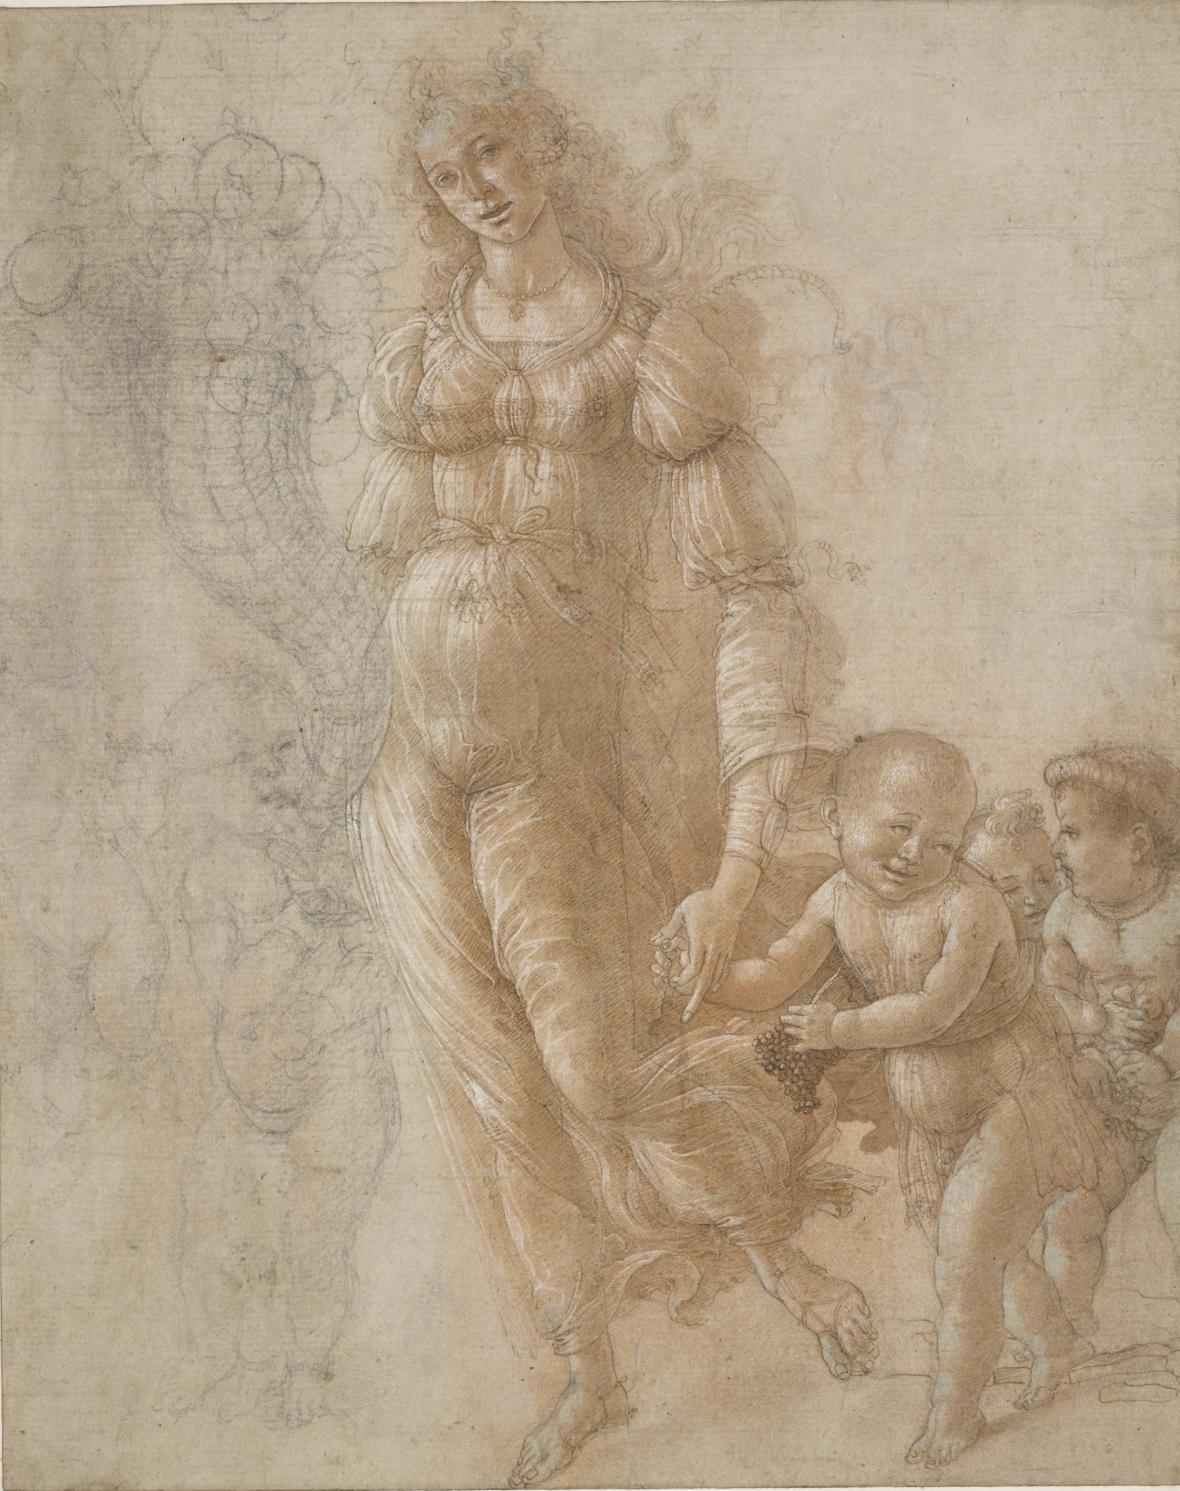 Sandro Botticelli / Alegorie hojnosti nebo podzimu, 1470-75